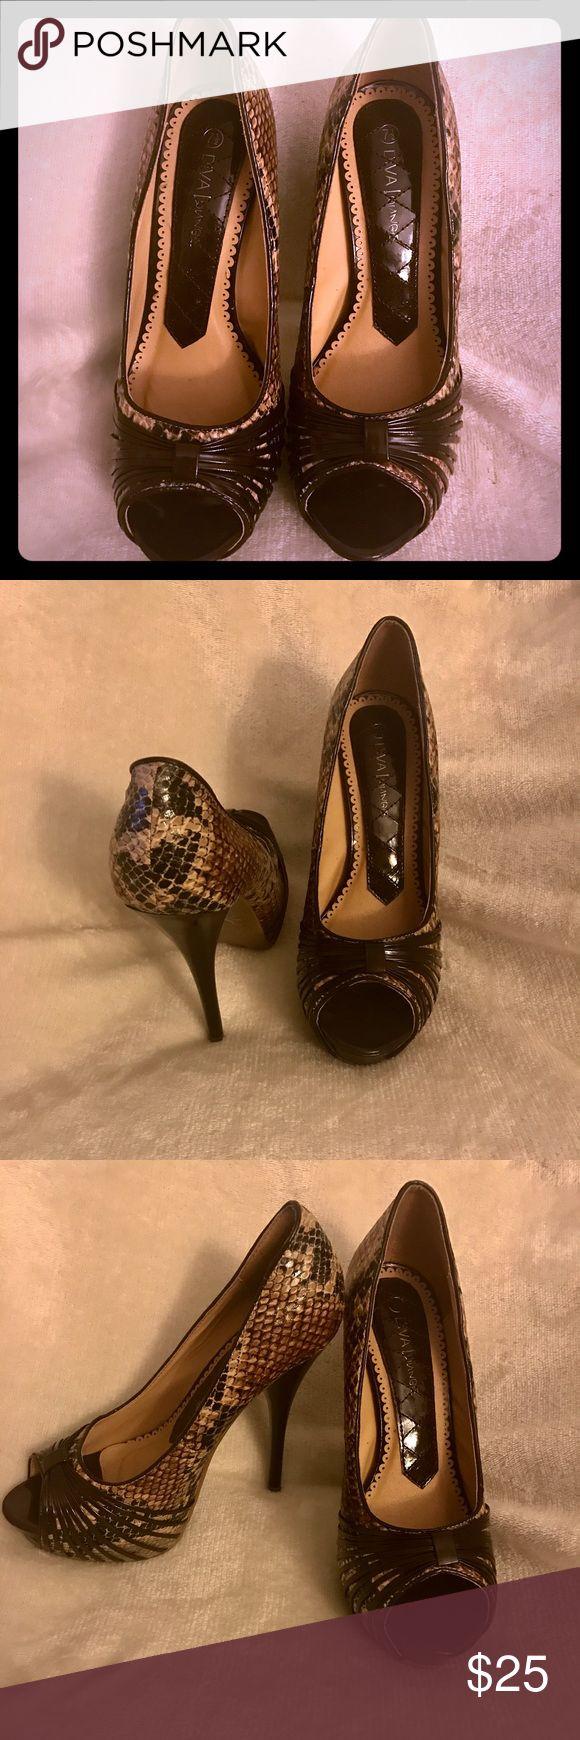 New high heels.7 1/2Brown and beige, snake print. New Diva High heels . Snake print , brown and beige. Shoes Heels